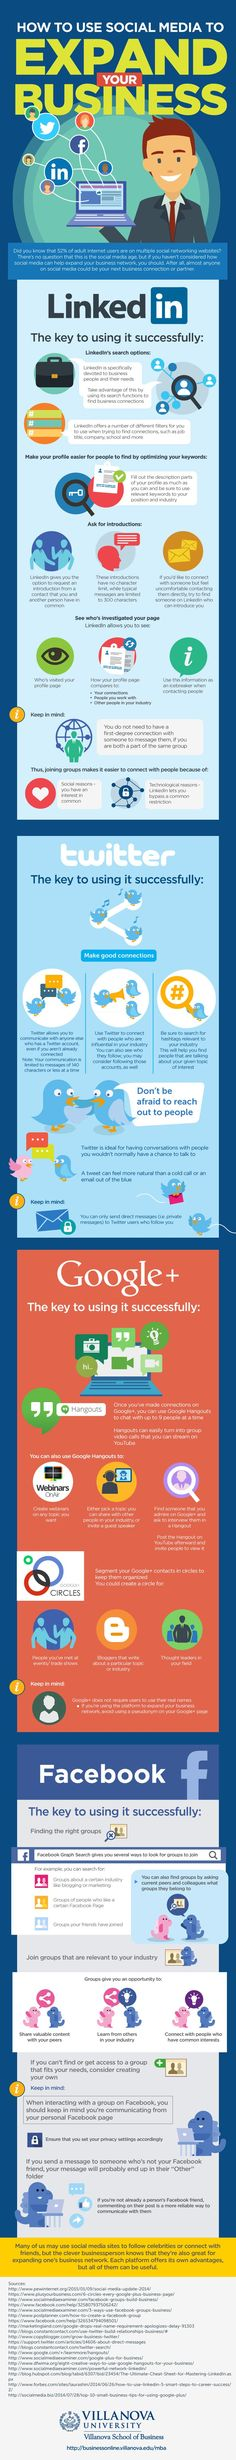 How to use socia media marketing infographic